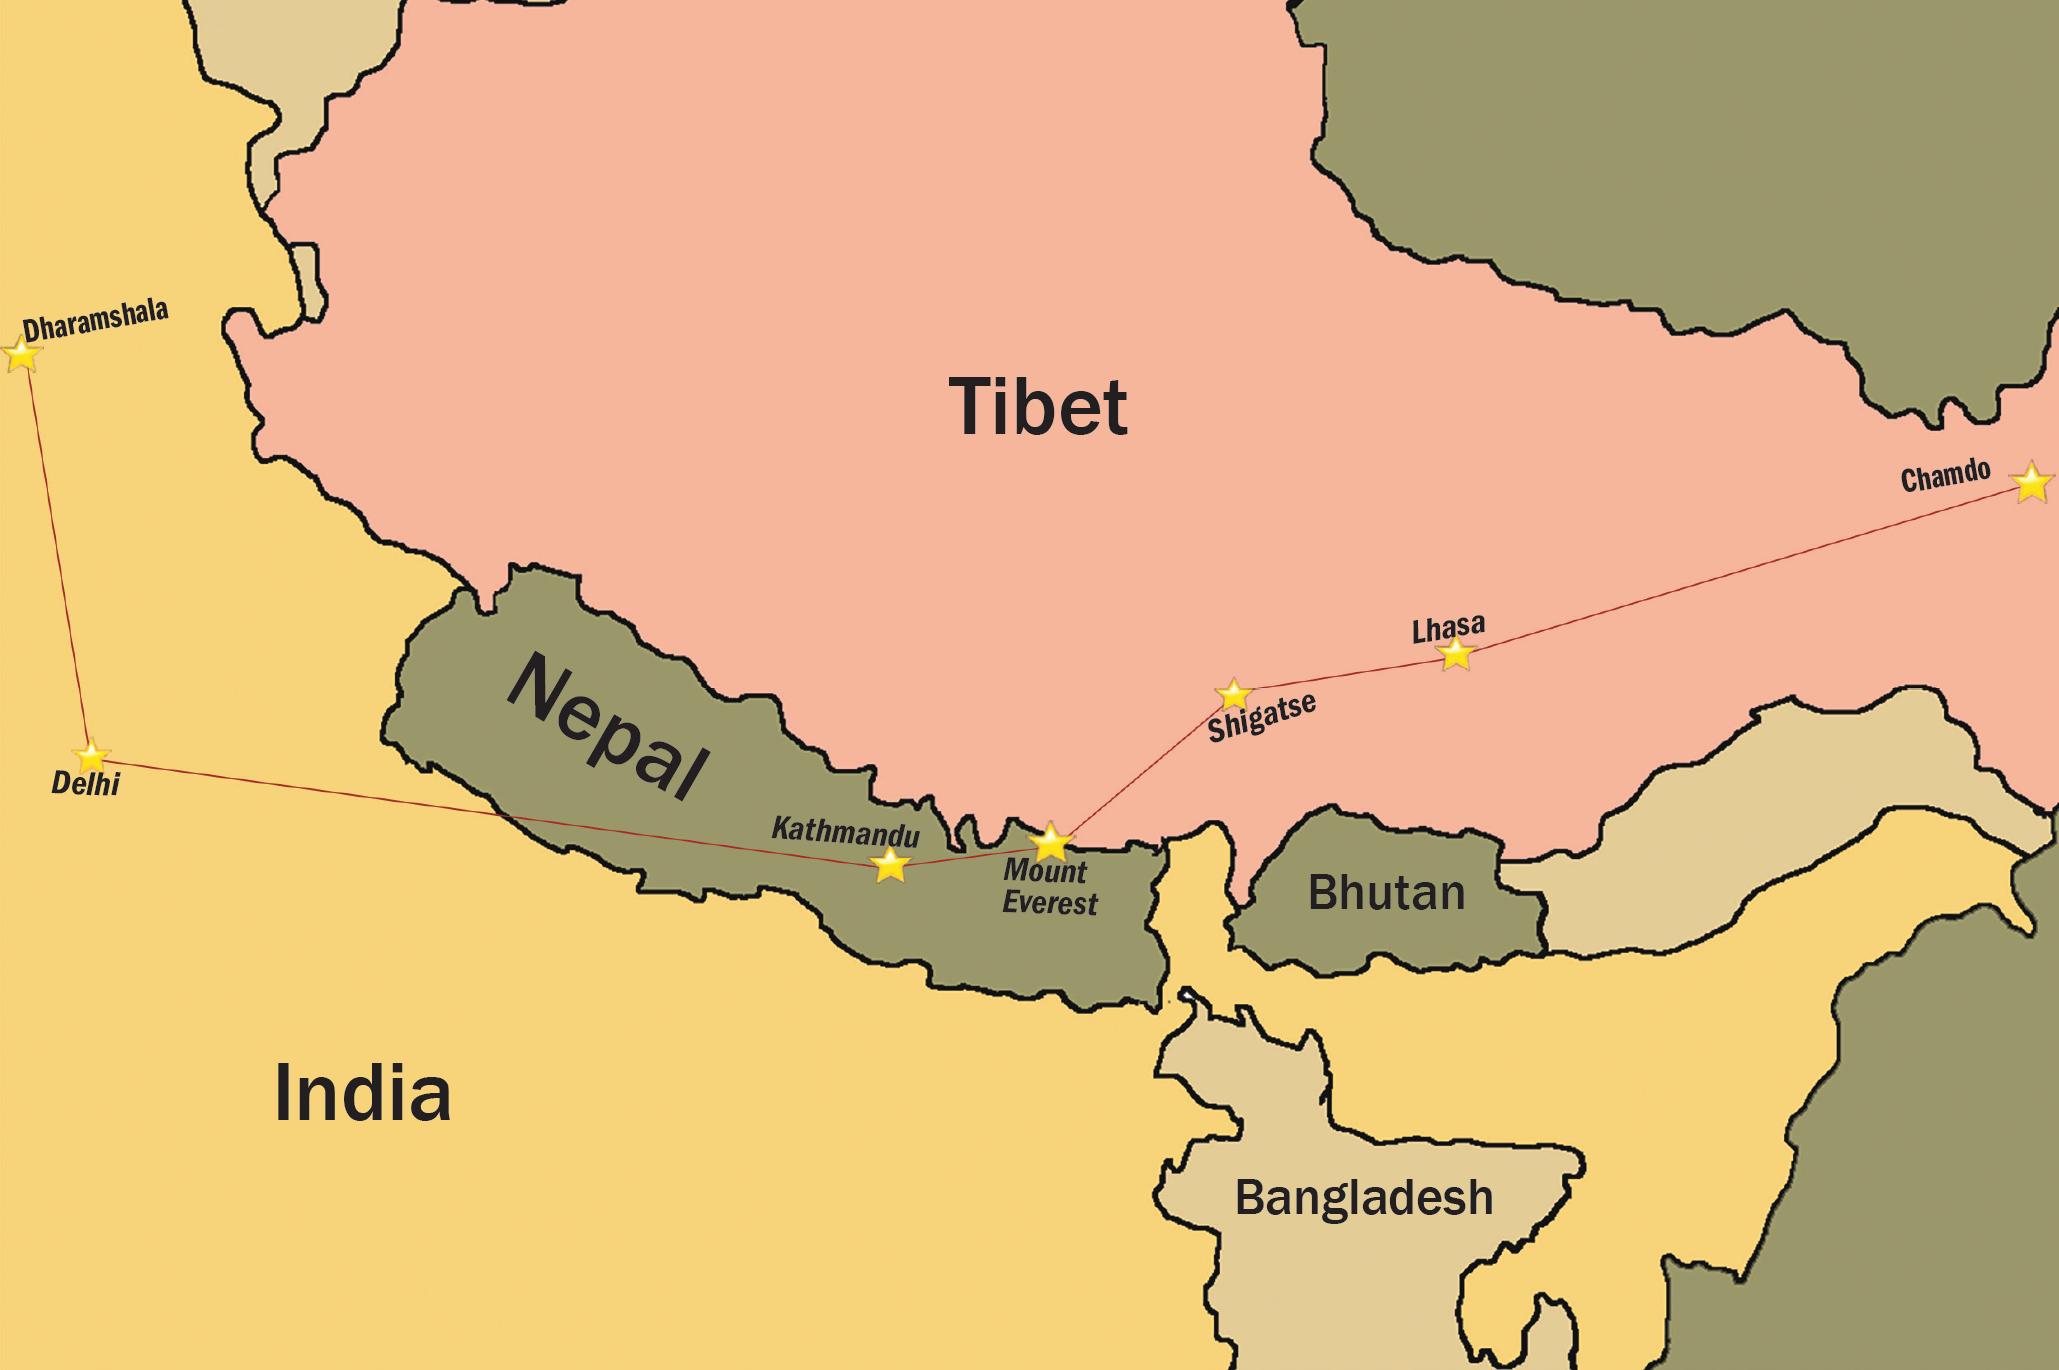 Two more years: Tibetan memoir in the making